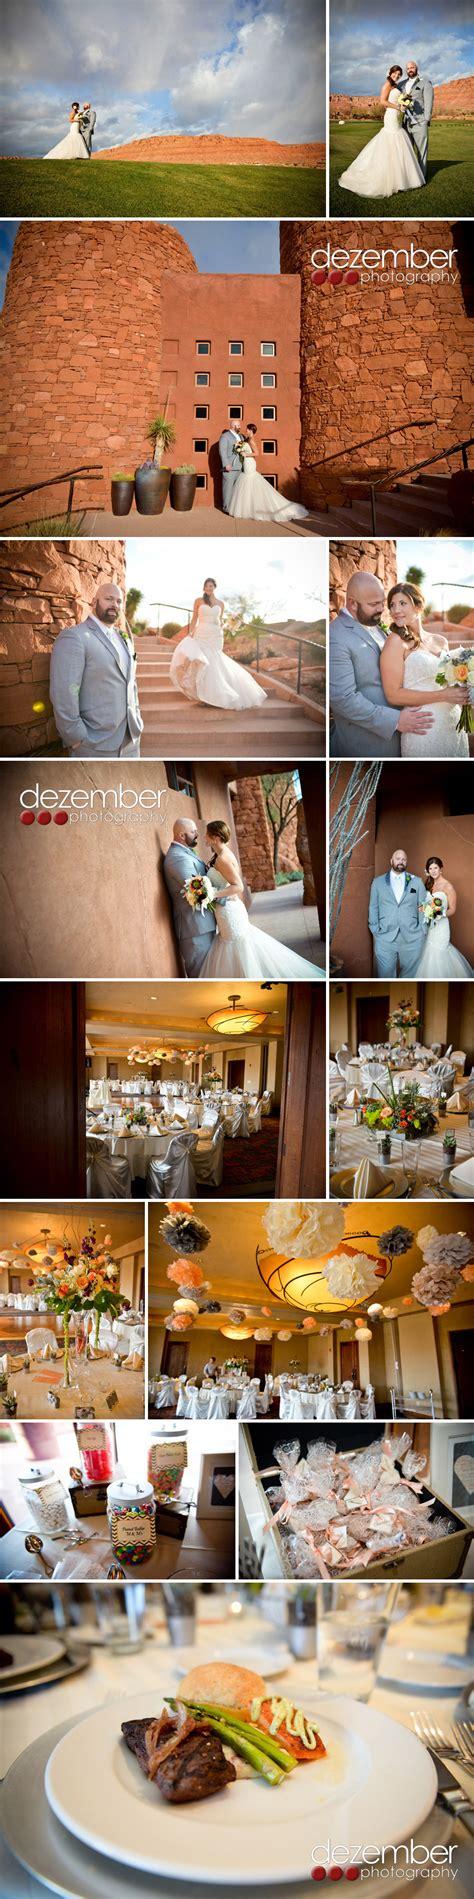 brandon amy st george wedding photographers